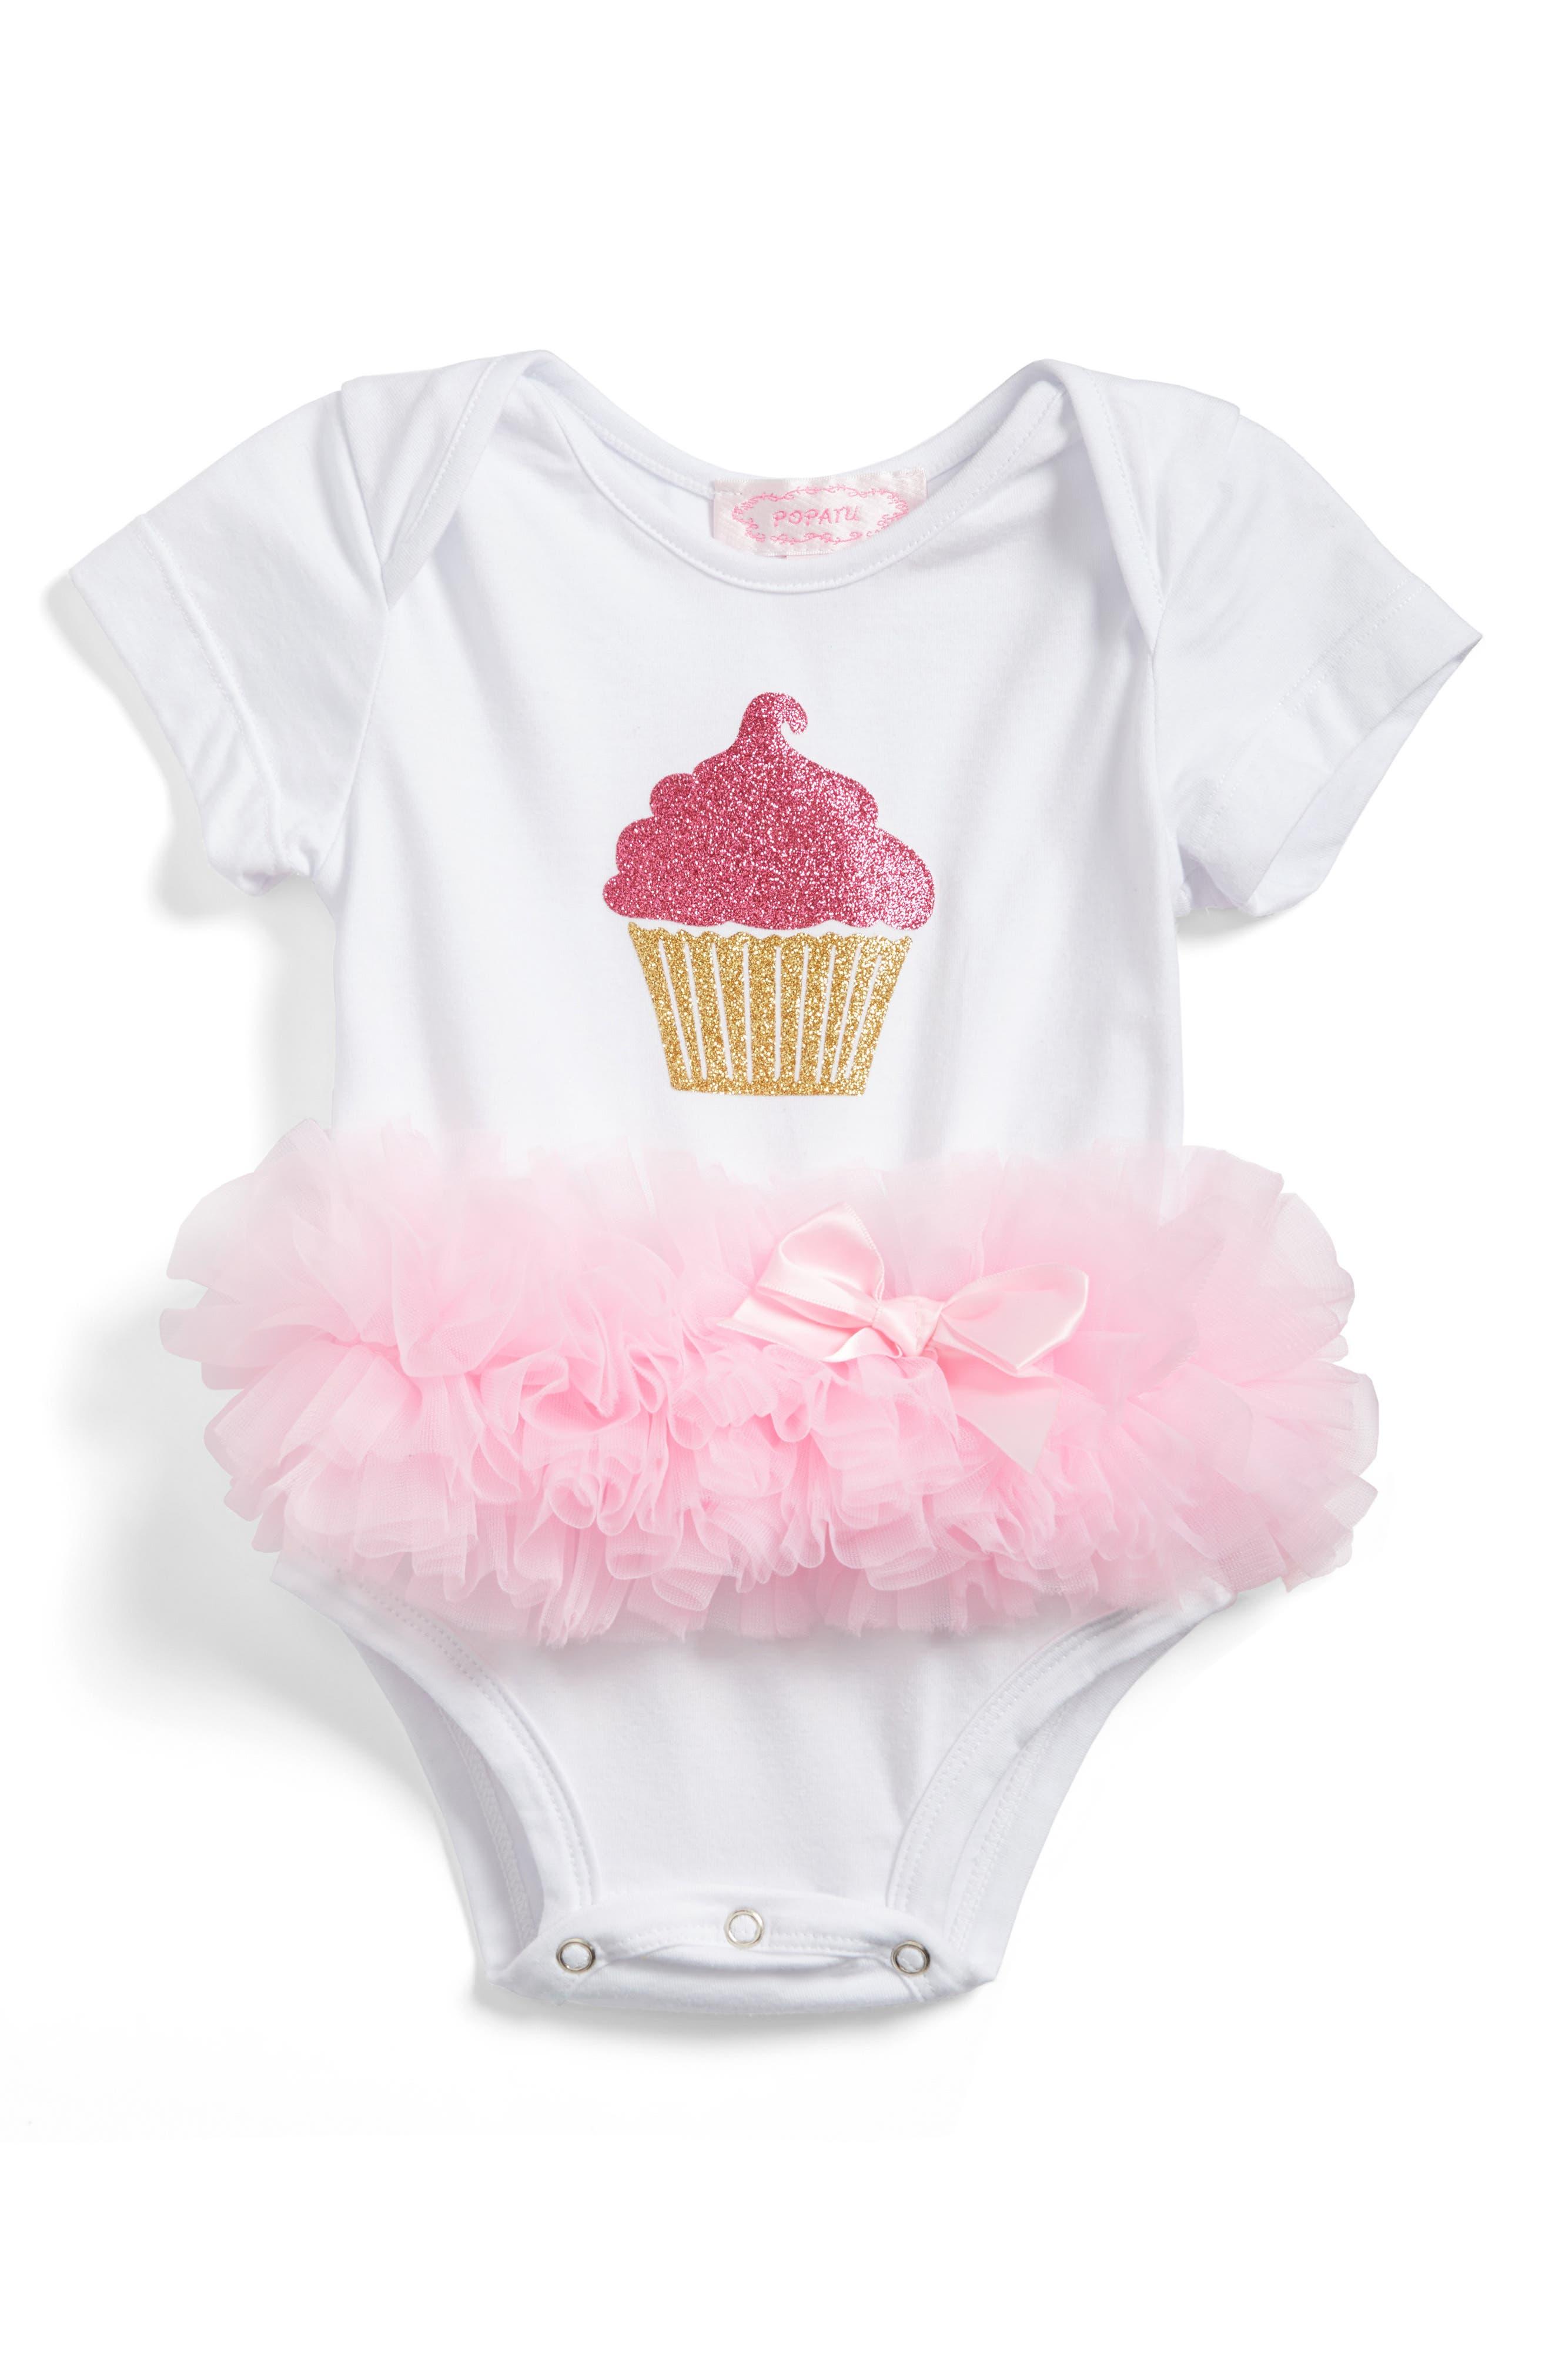 Cupcake Tutu Skirted Bodysuit,                             Main thumbnail 1, color,                             WHITE